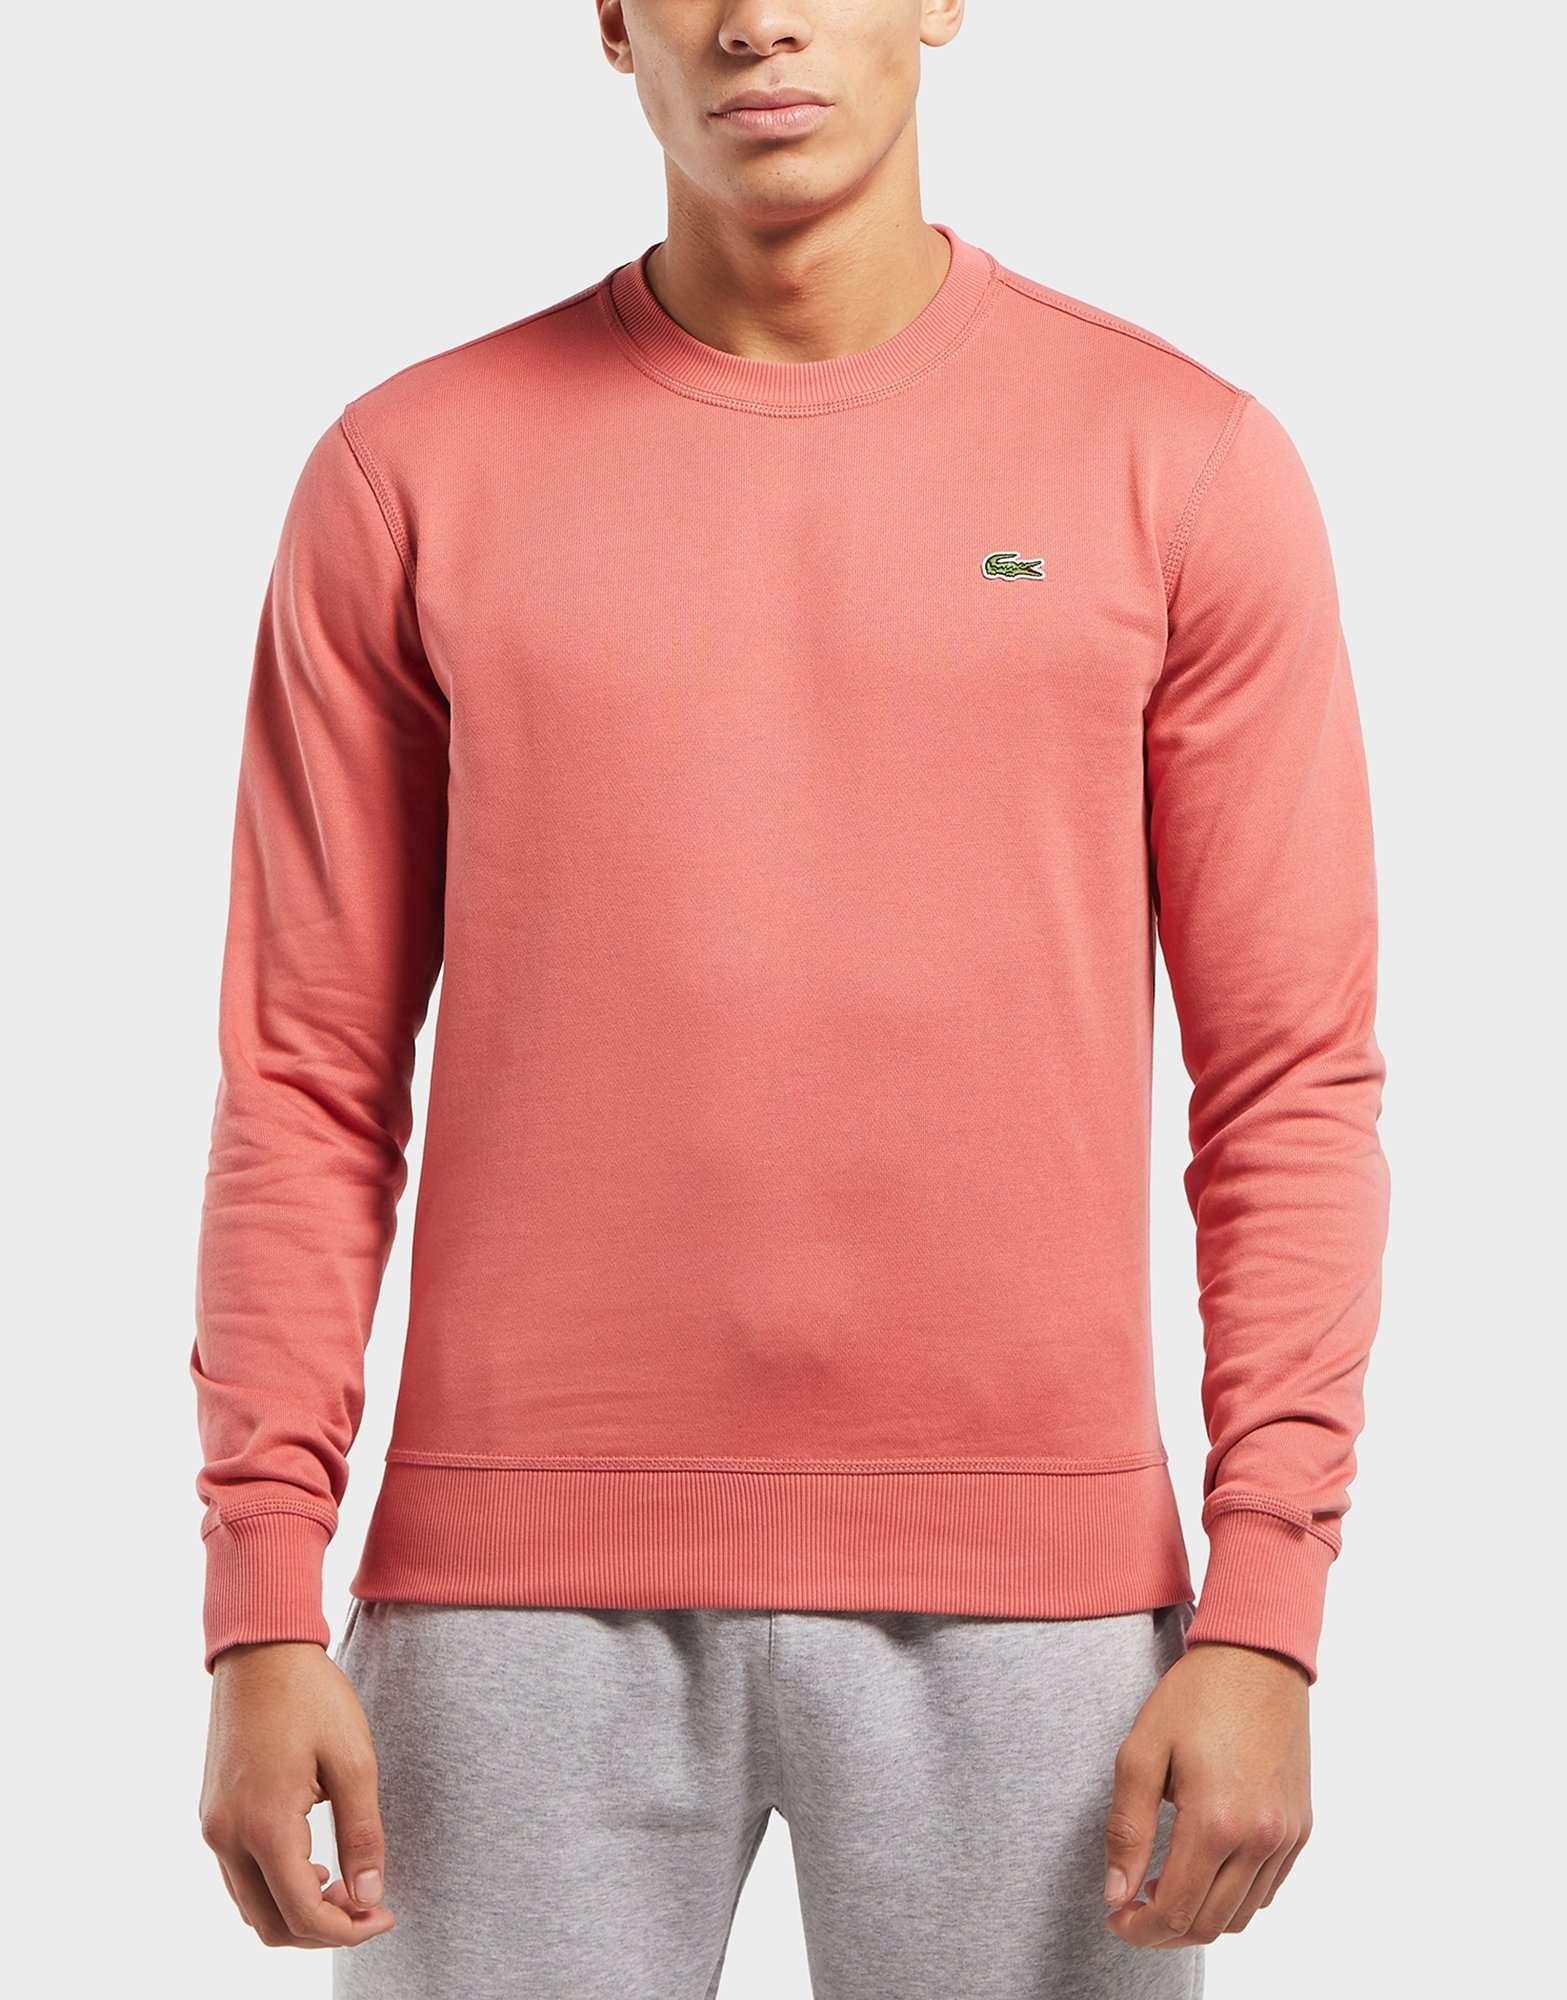 Lacoste Retro Block Crew Sweatshirt